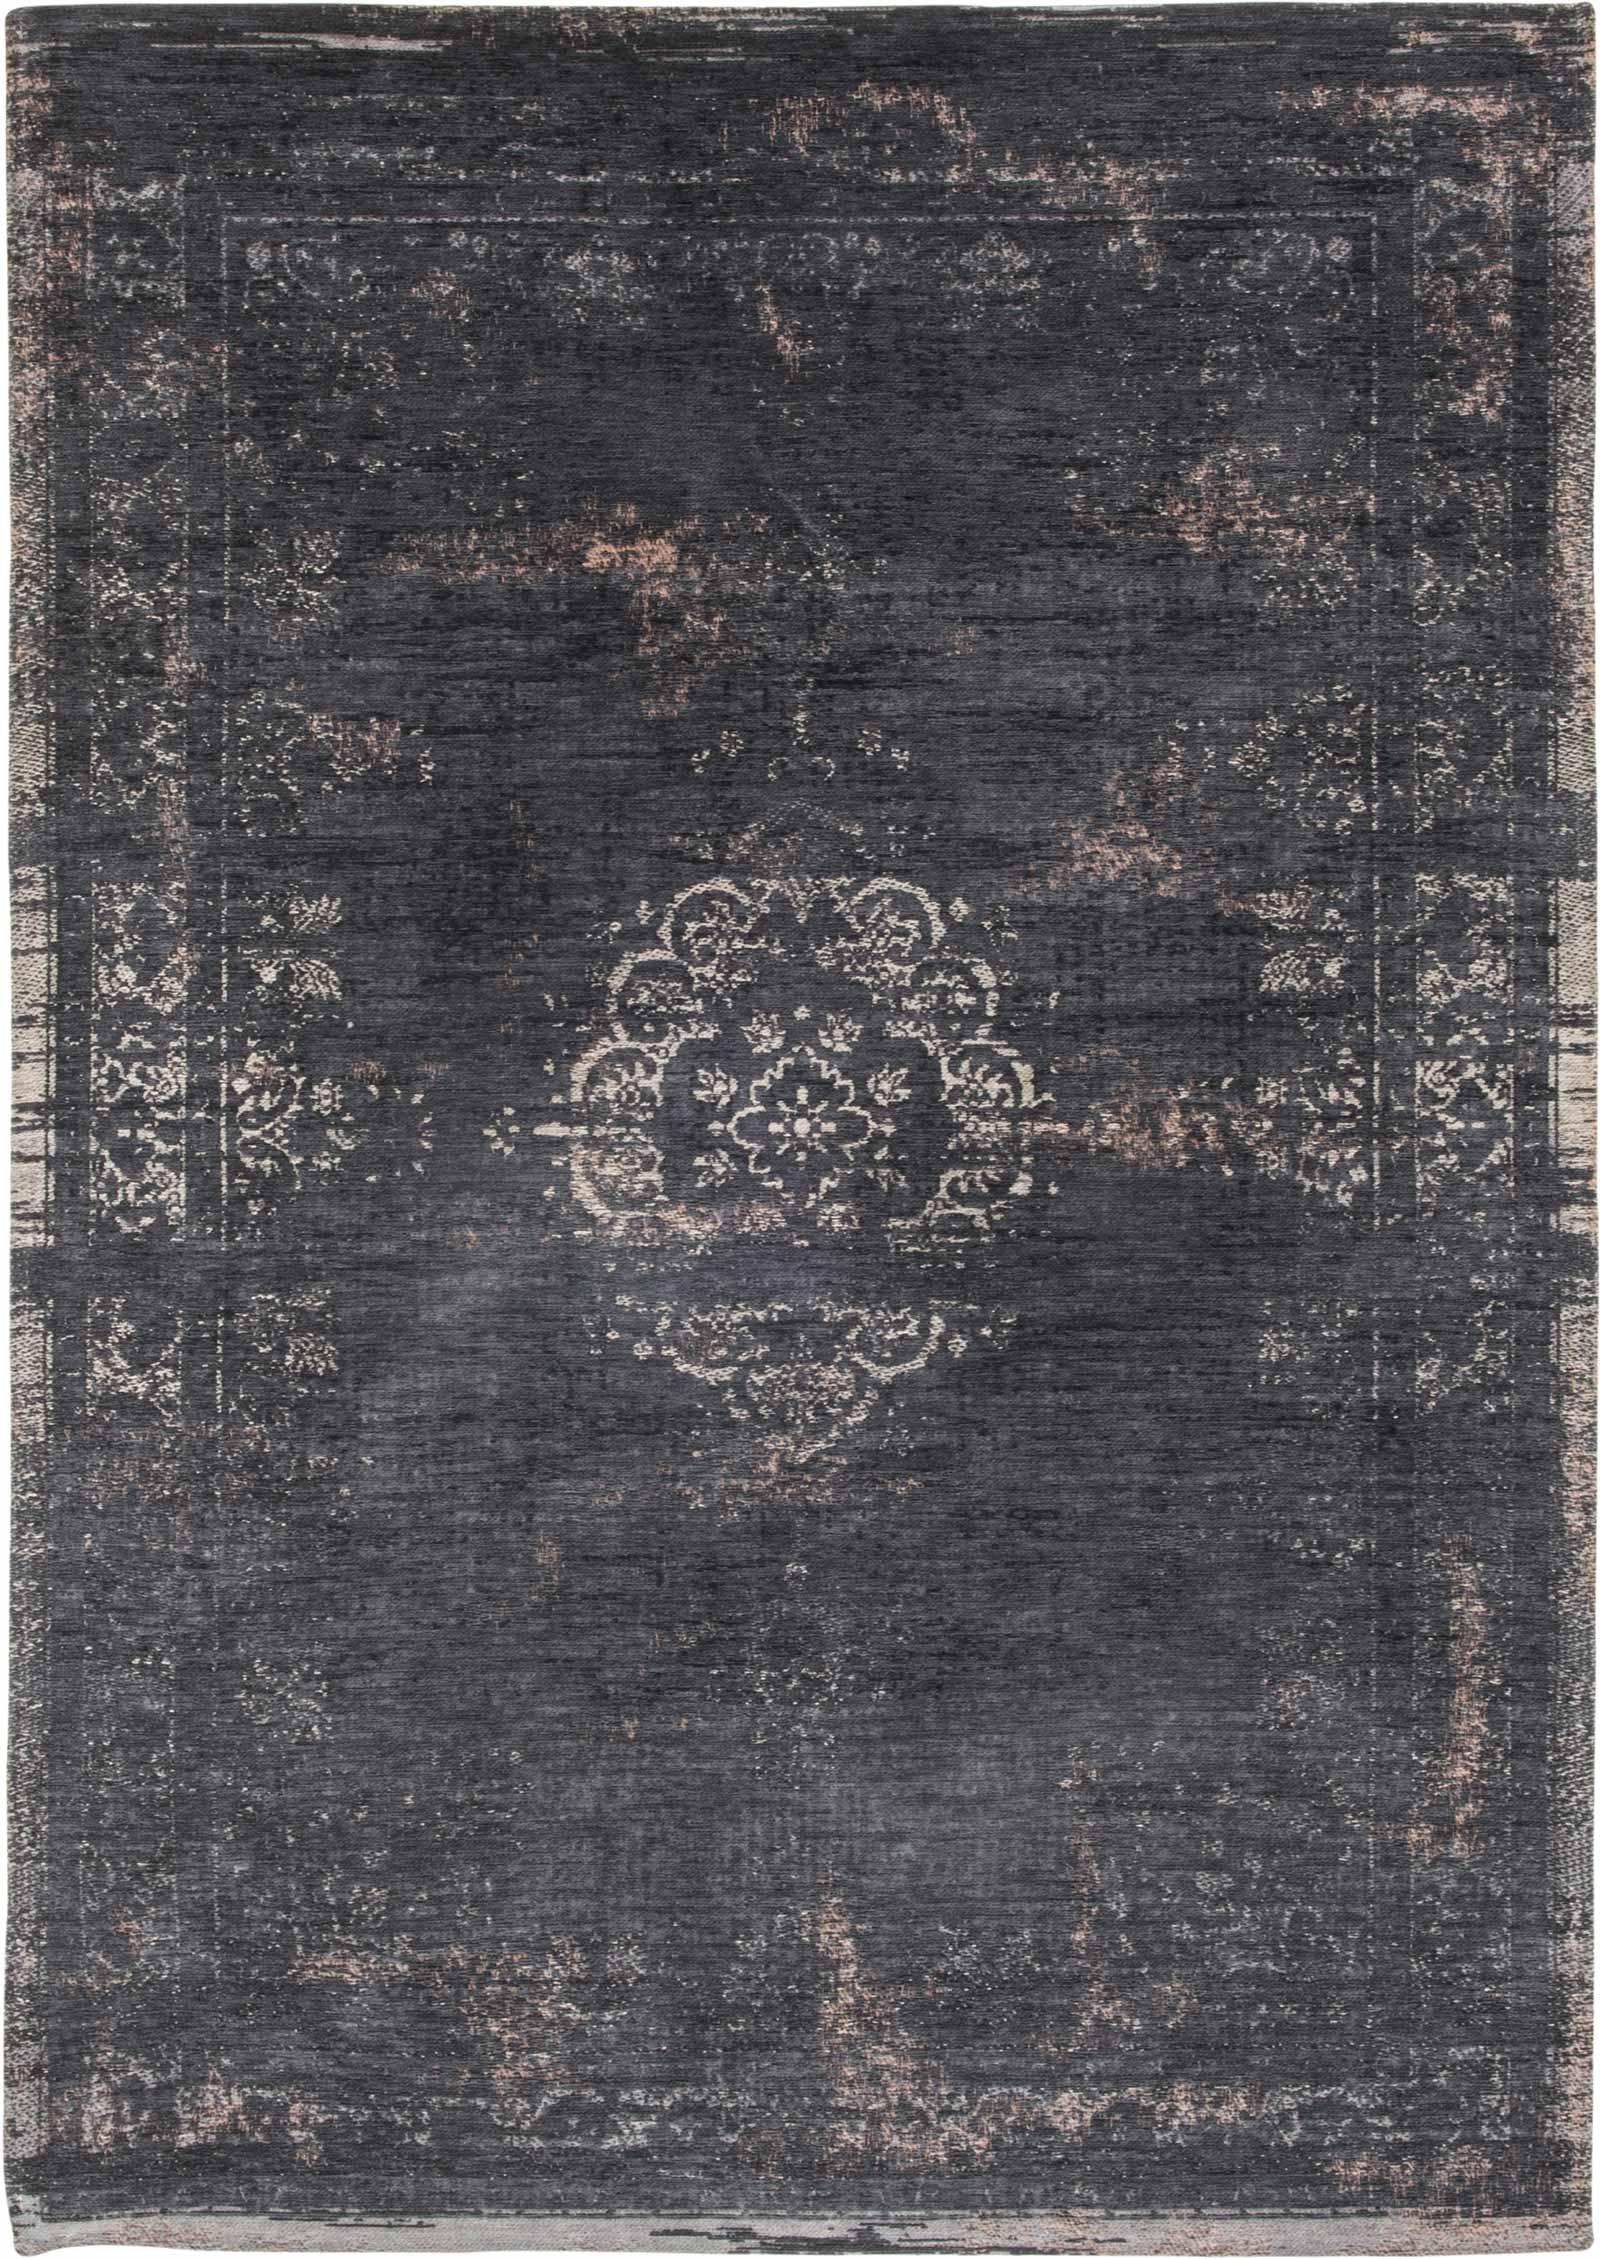 alfombras Louis De Poortere LX8263 Fading World Medaillon Mineral Black